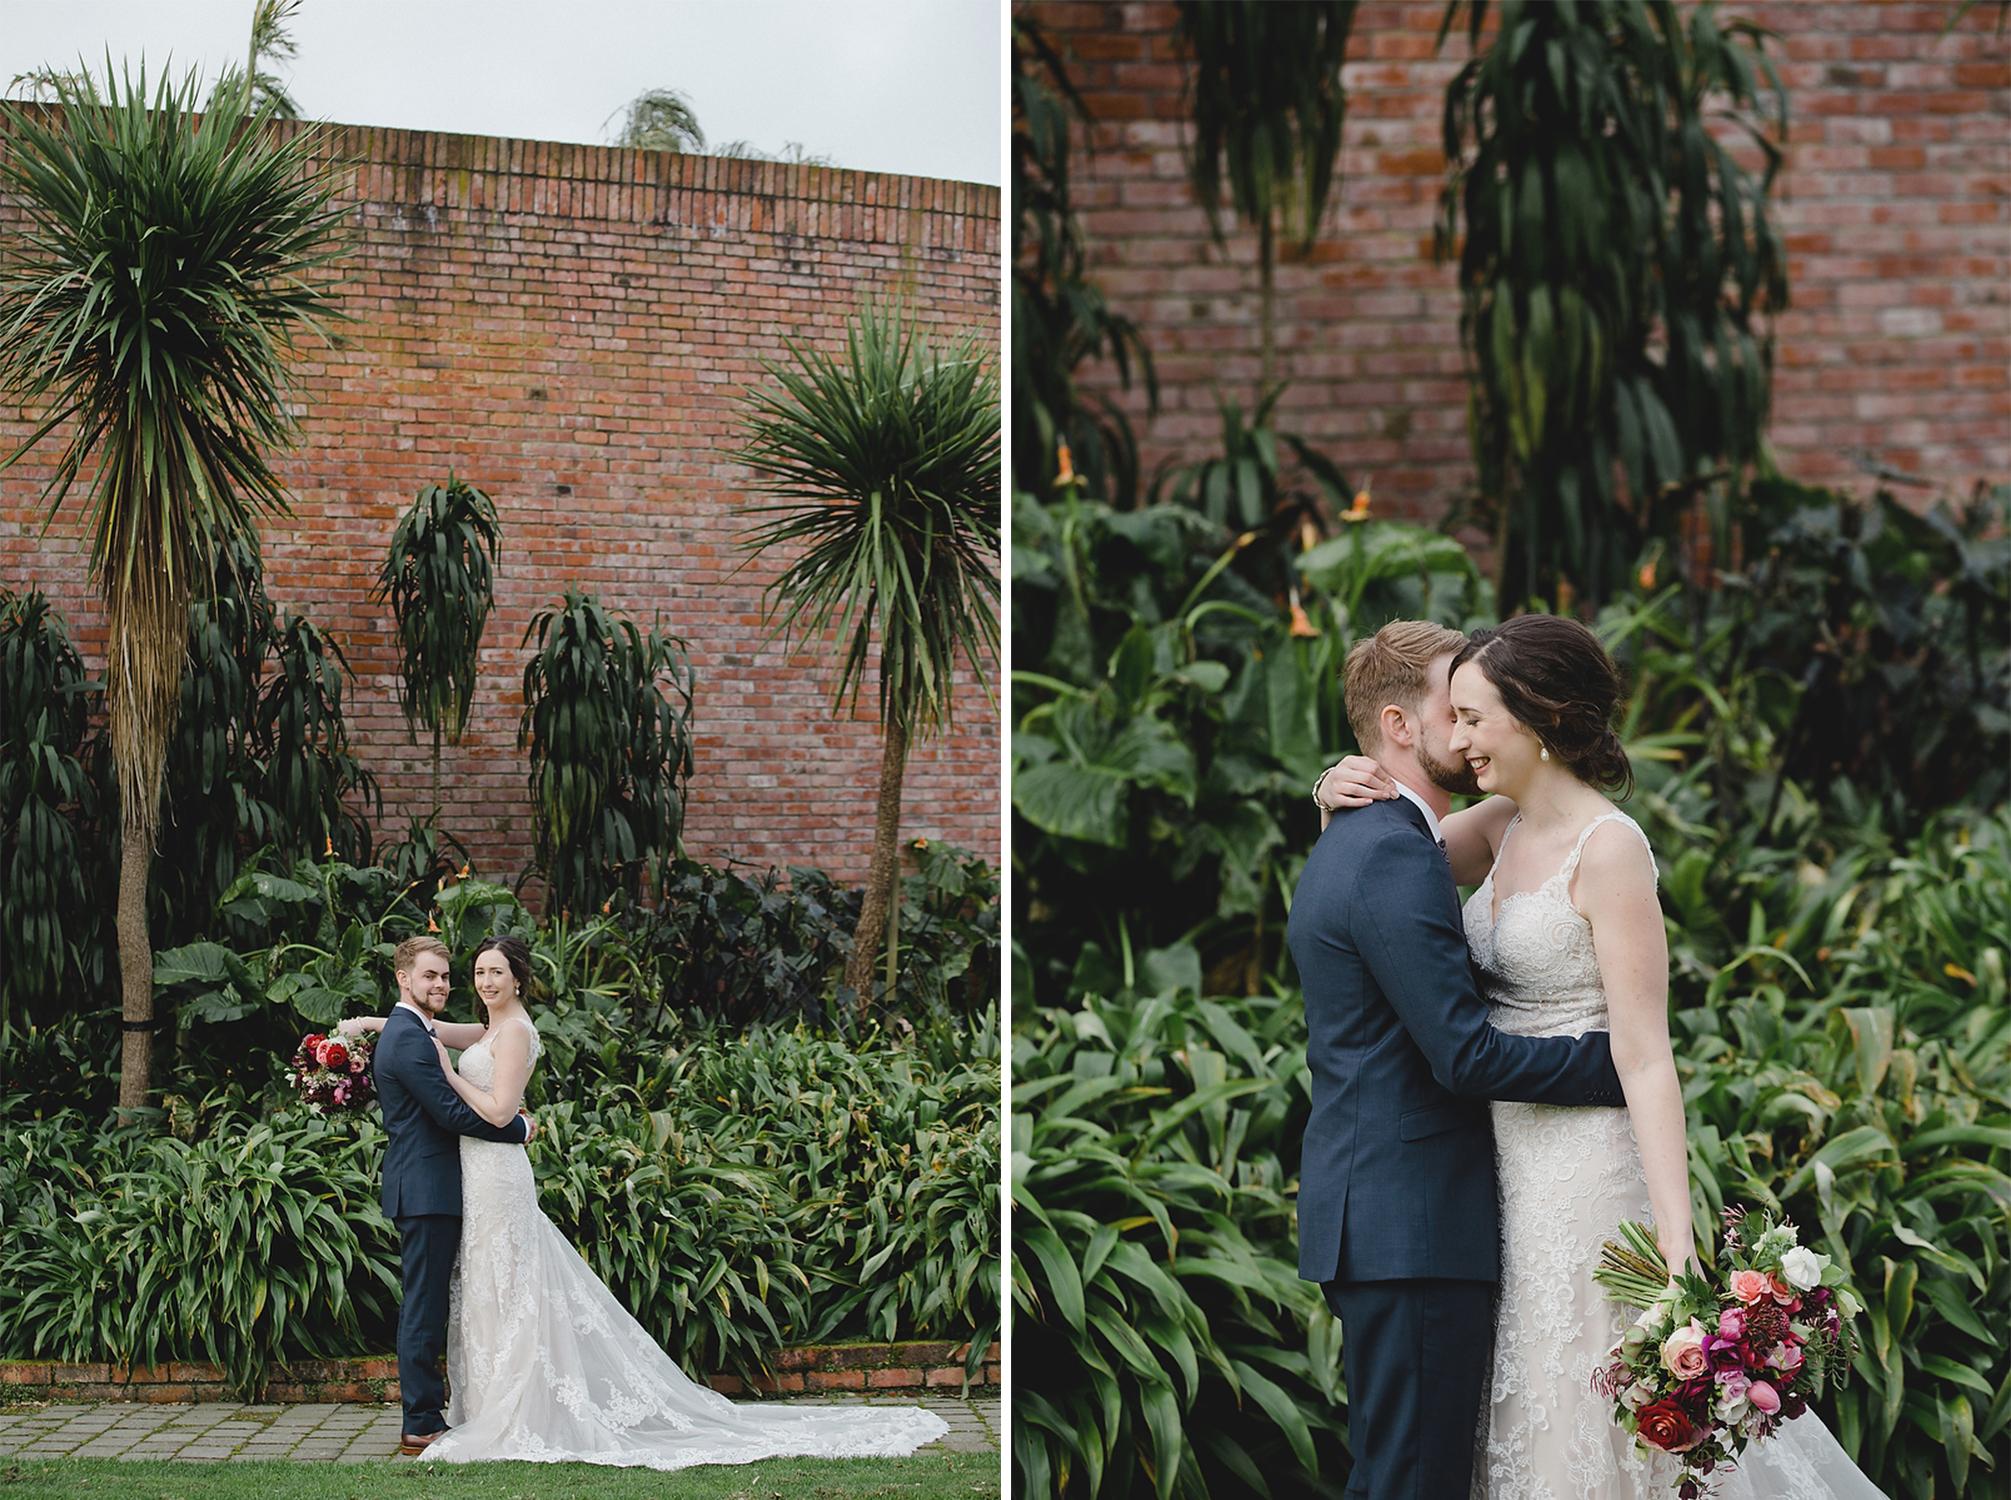 wellington wedding photography NZ - 0149.JPG